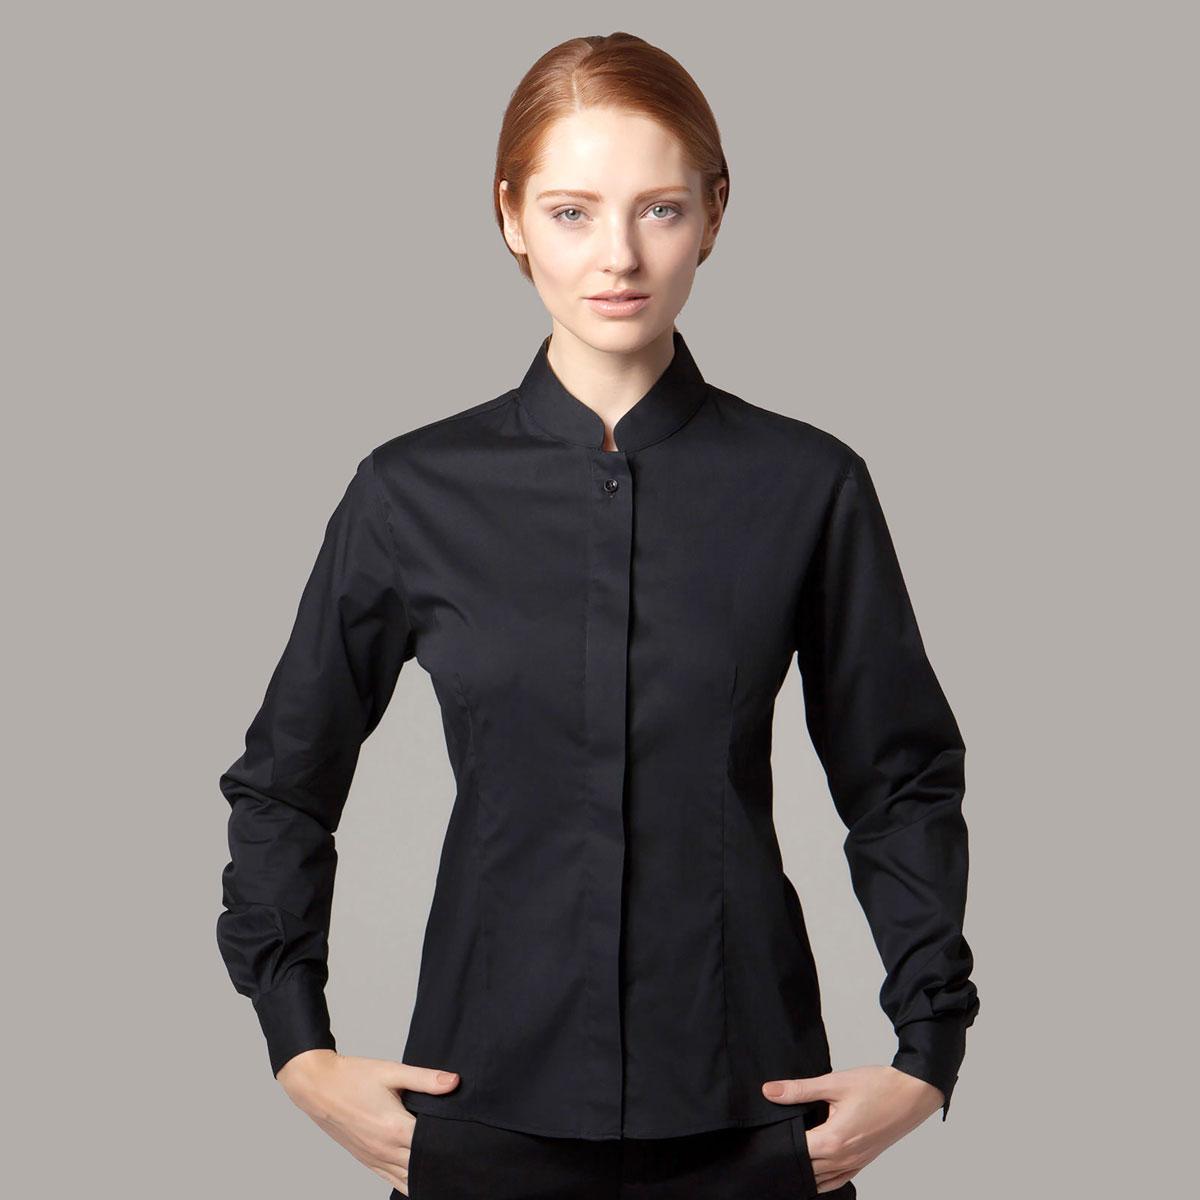 Ladies Mandarin Collar Bar Shirt Long Sleeve - KK740